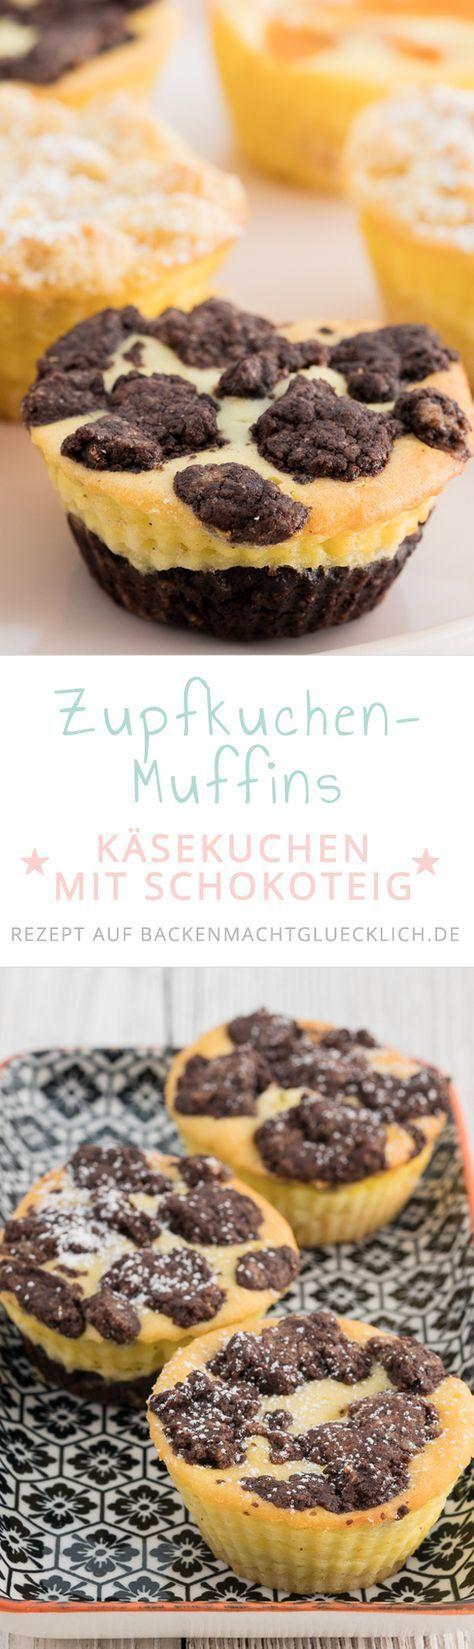 Käsekuchen-Muffins Recipe Kuchen, Muffin cupcake and Food - chefkoch käsekuchen muffins